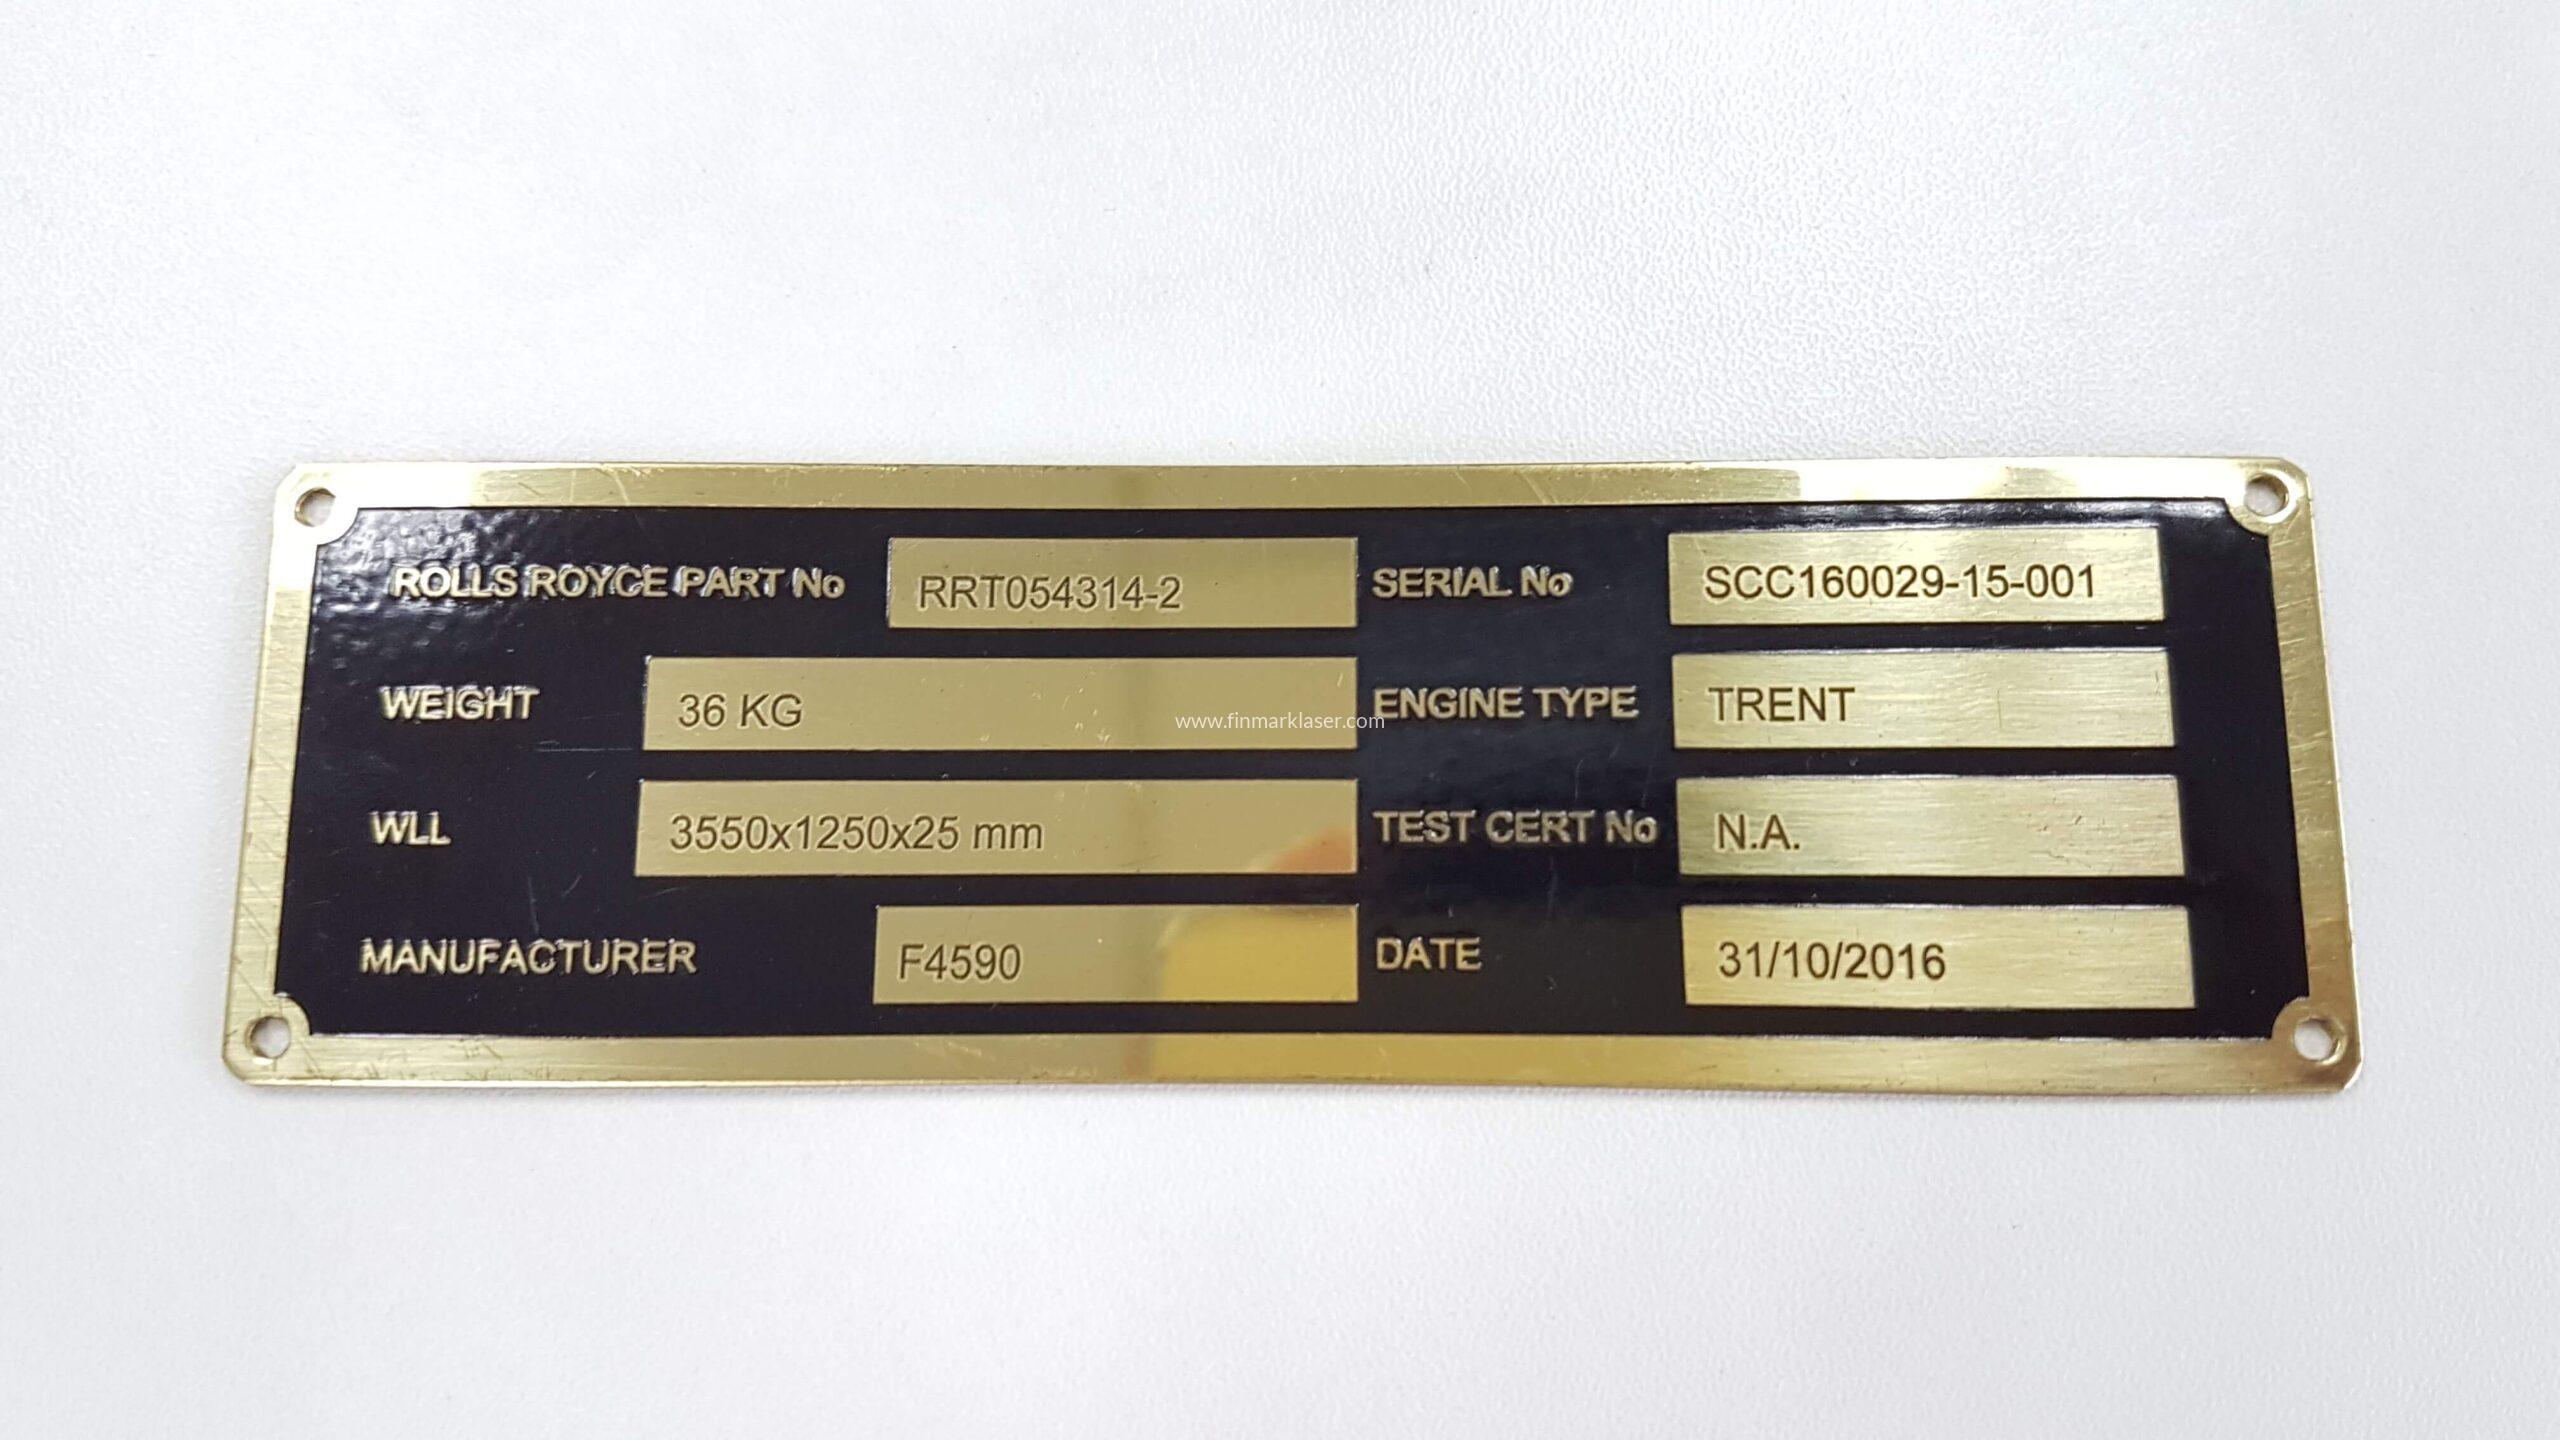 Dataplate-label-scaled-1.jpg